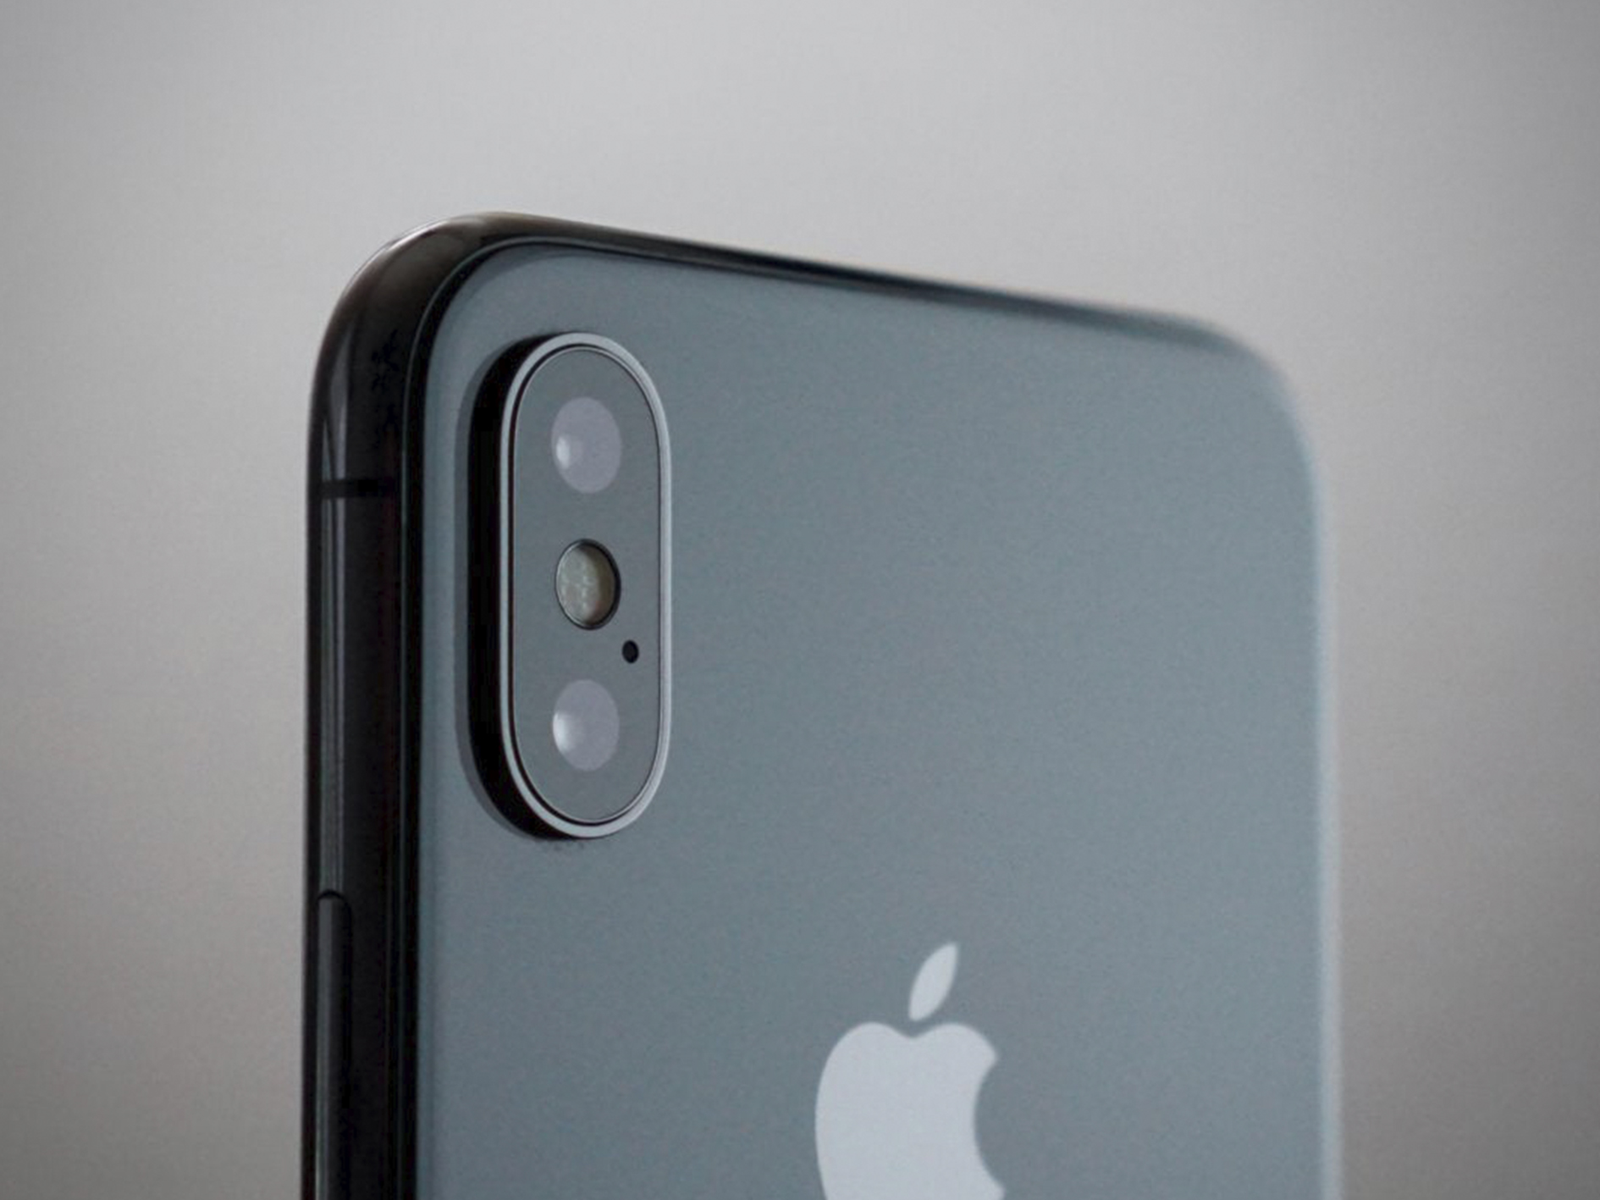 Cambiar la cámara rota de iPhone X